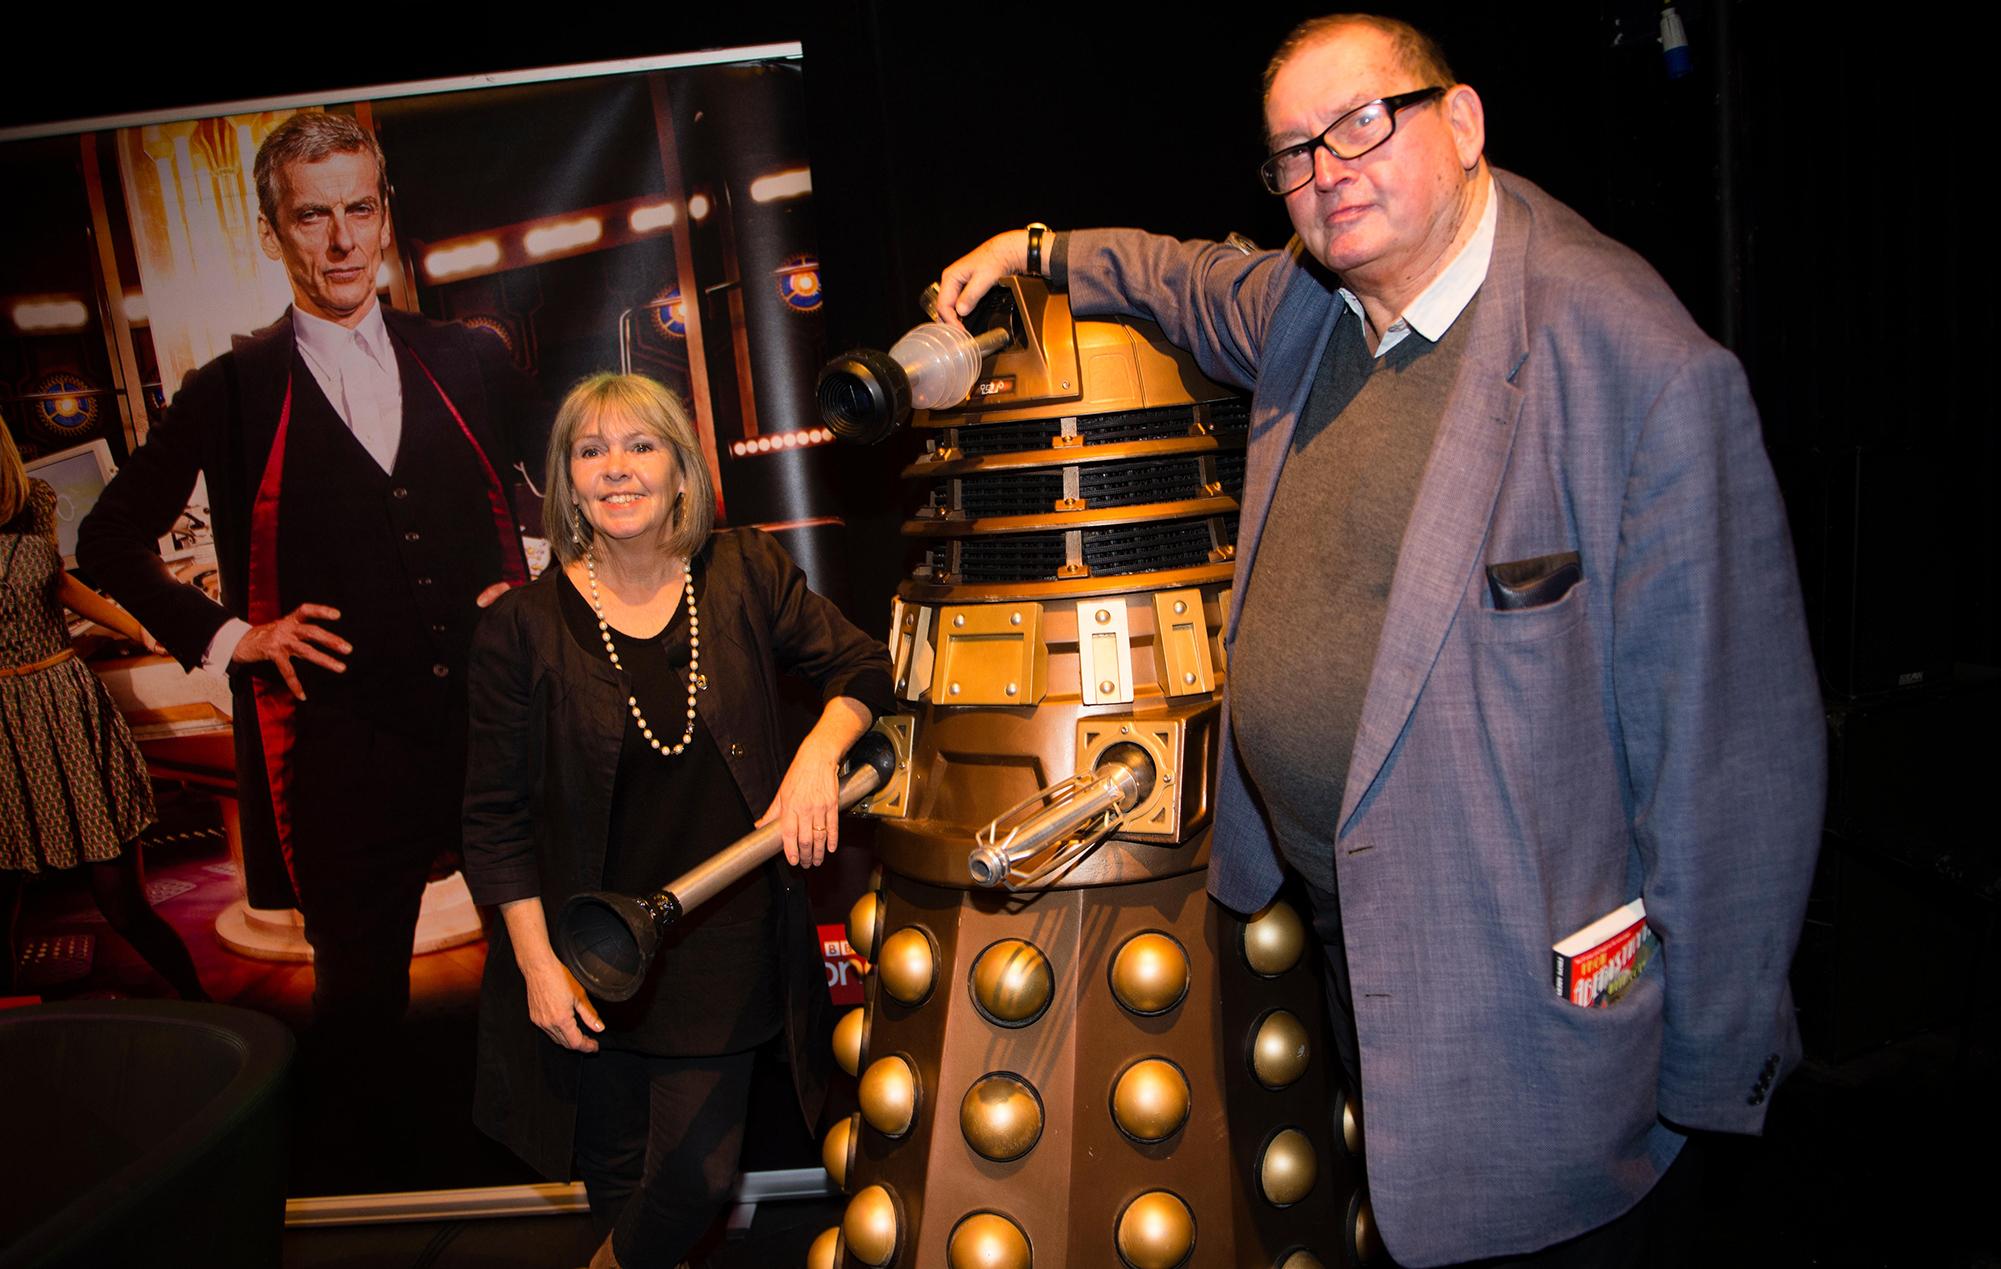 Terrance Dicks Doctor Who writer death